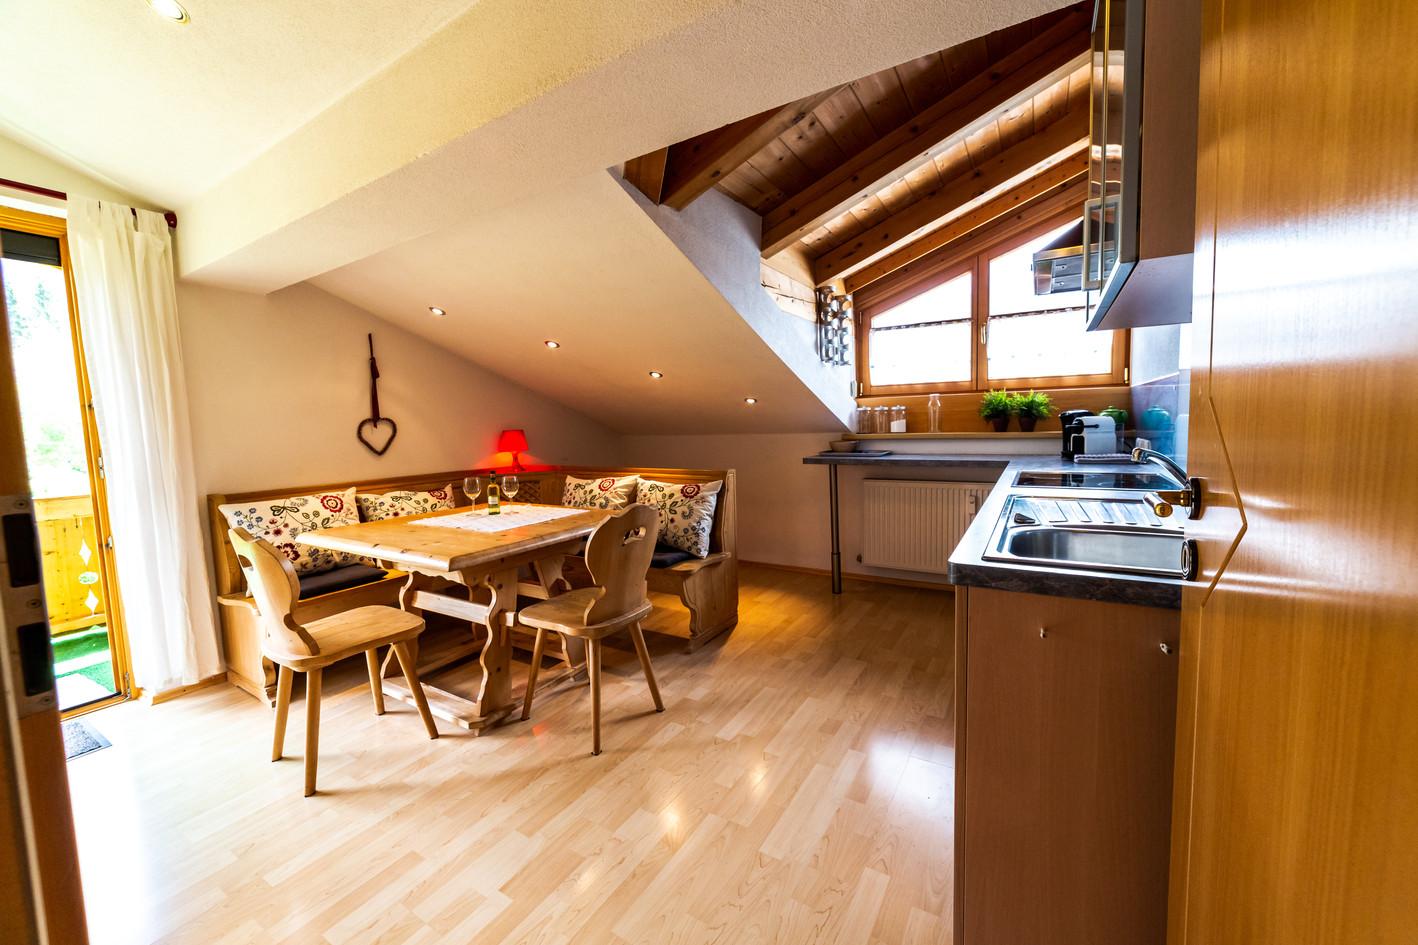 schneehaus chalet weiberhimmel livingroo